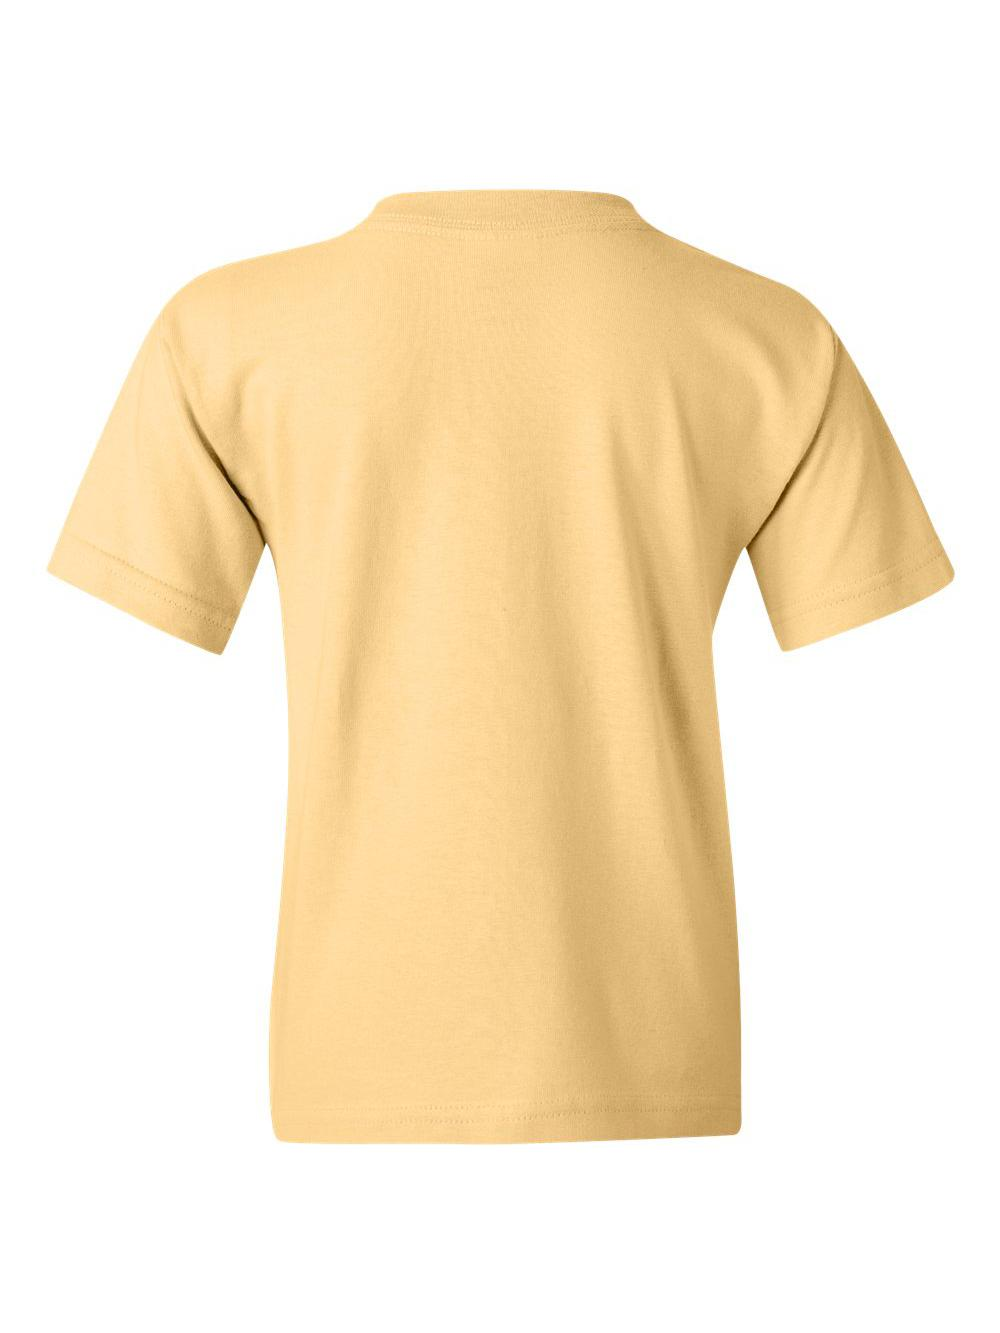 Gildan-Heavy-Cotton-Youth-T-Shirt-5000B thumbnail 151